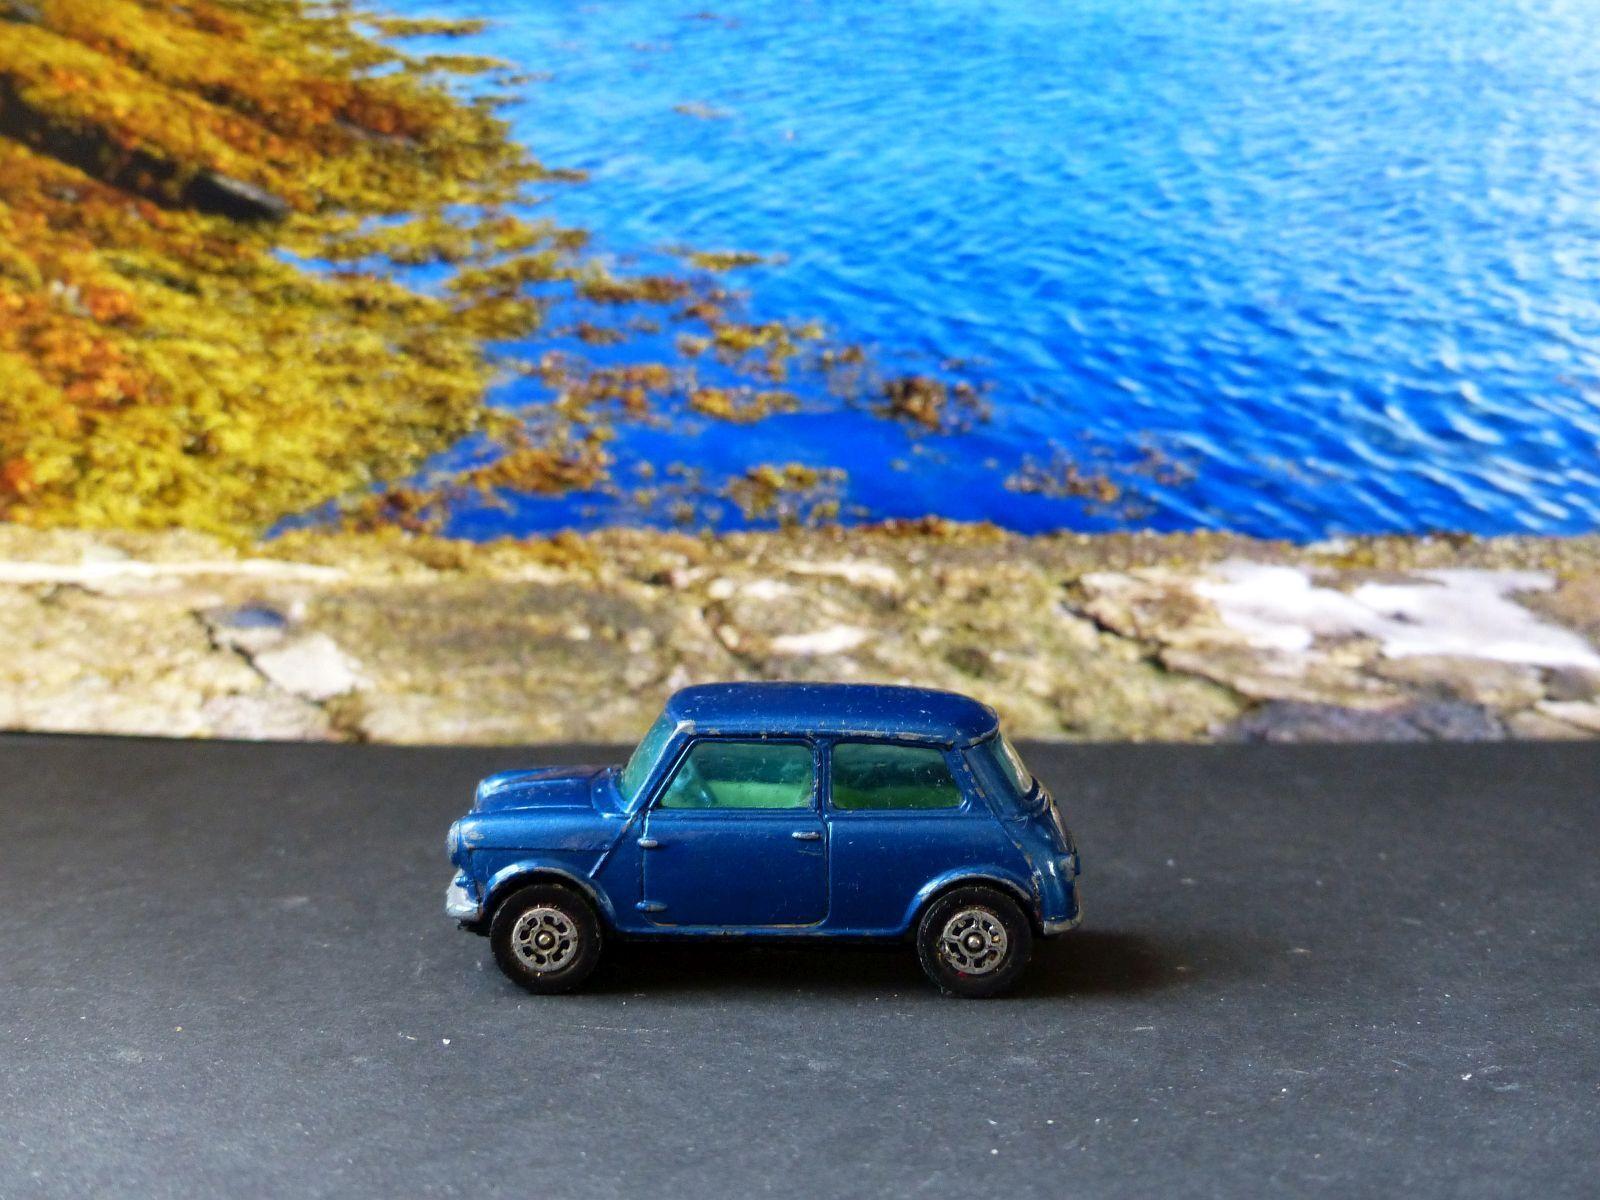 punto de venta en línea Corgi Juguetes Juguetes Juguetes 204 Morris Mini Minor azul con cristales tintados  varios tamaños